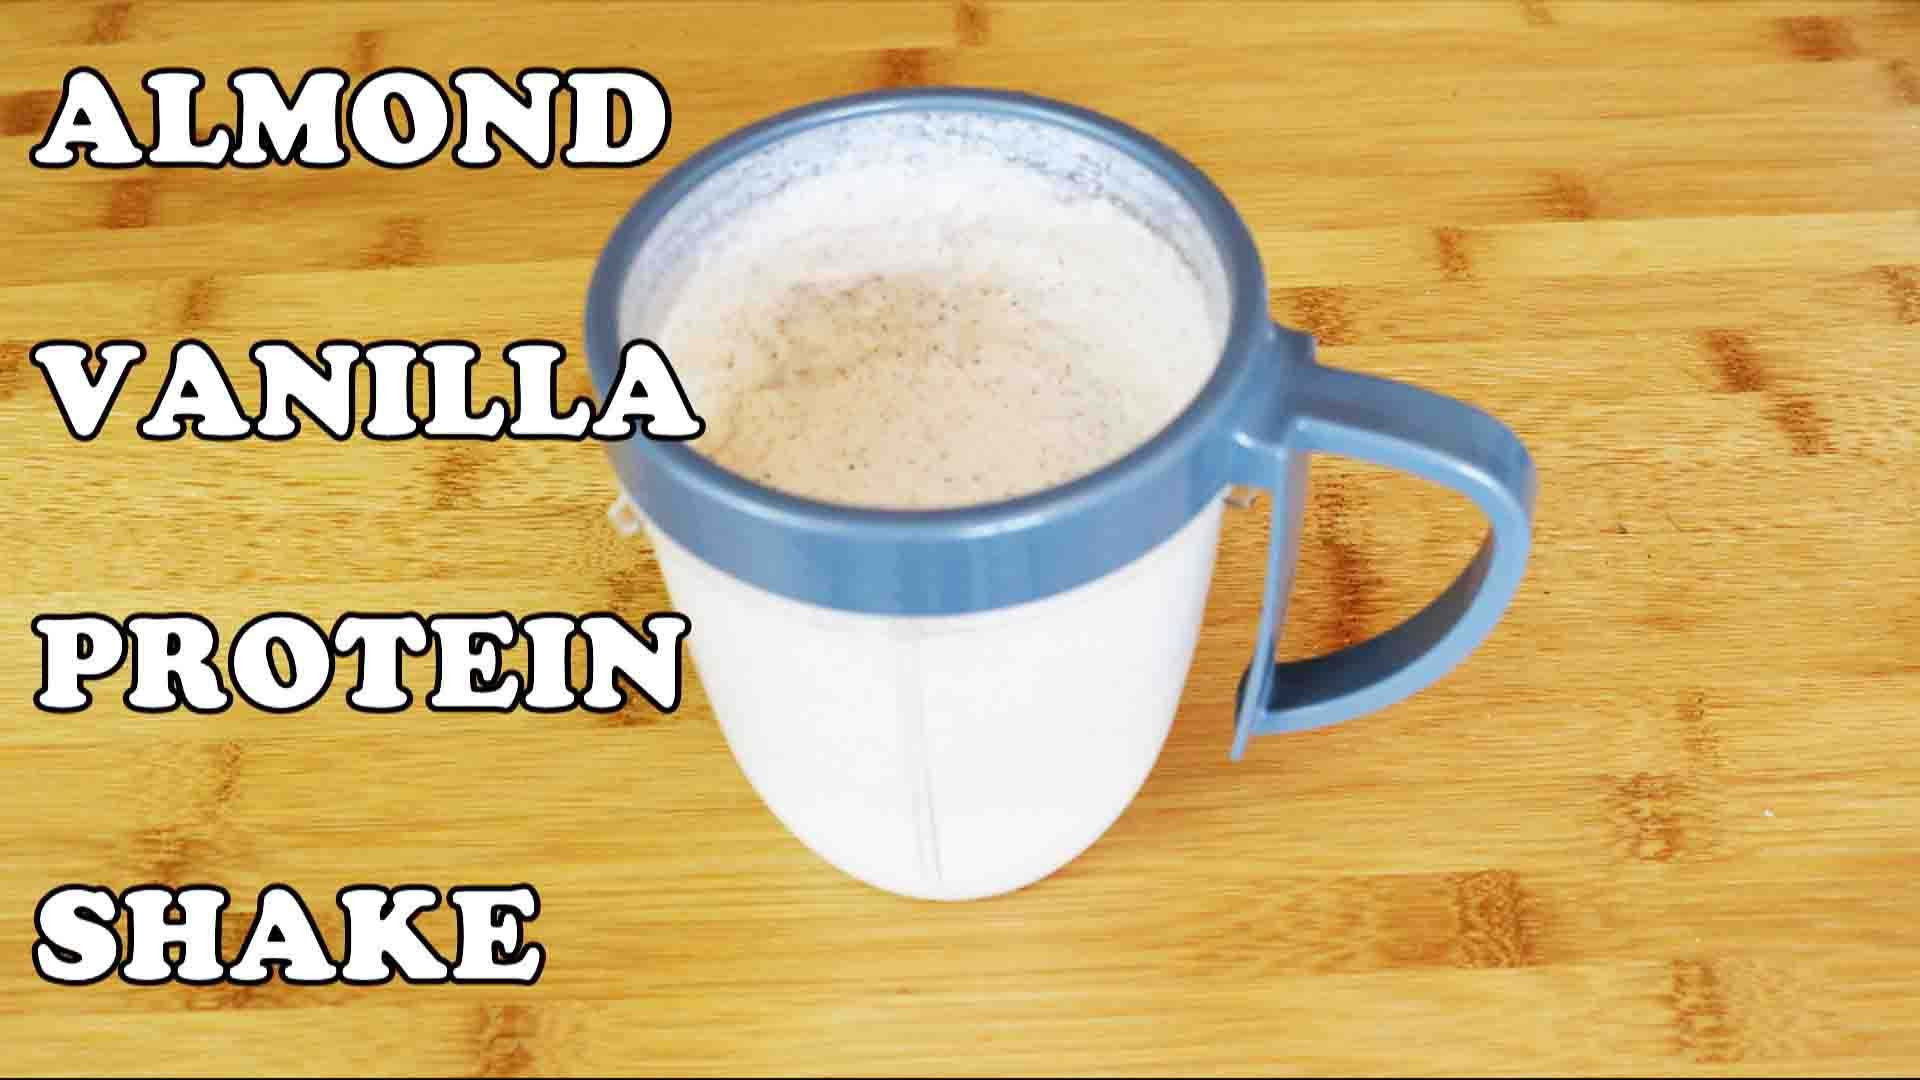 Keto Diet Protein Powder  low carb keto almond vanilla protein shake ketogenic t